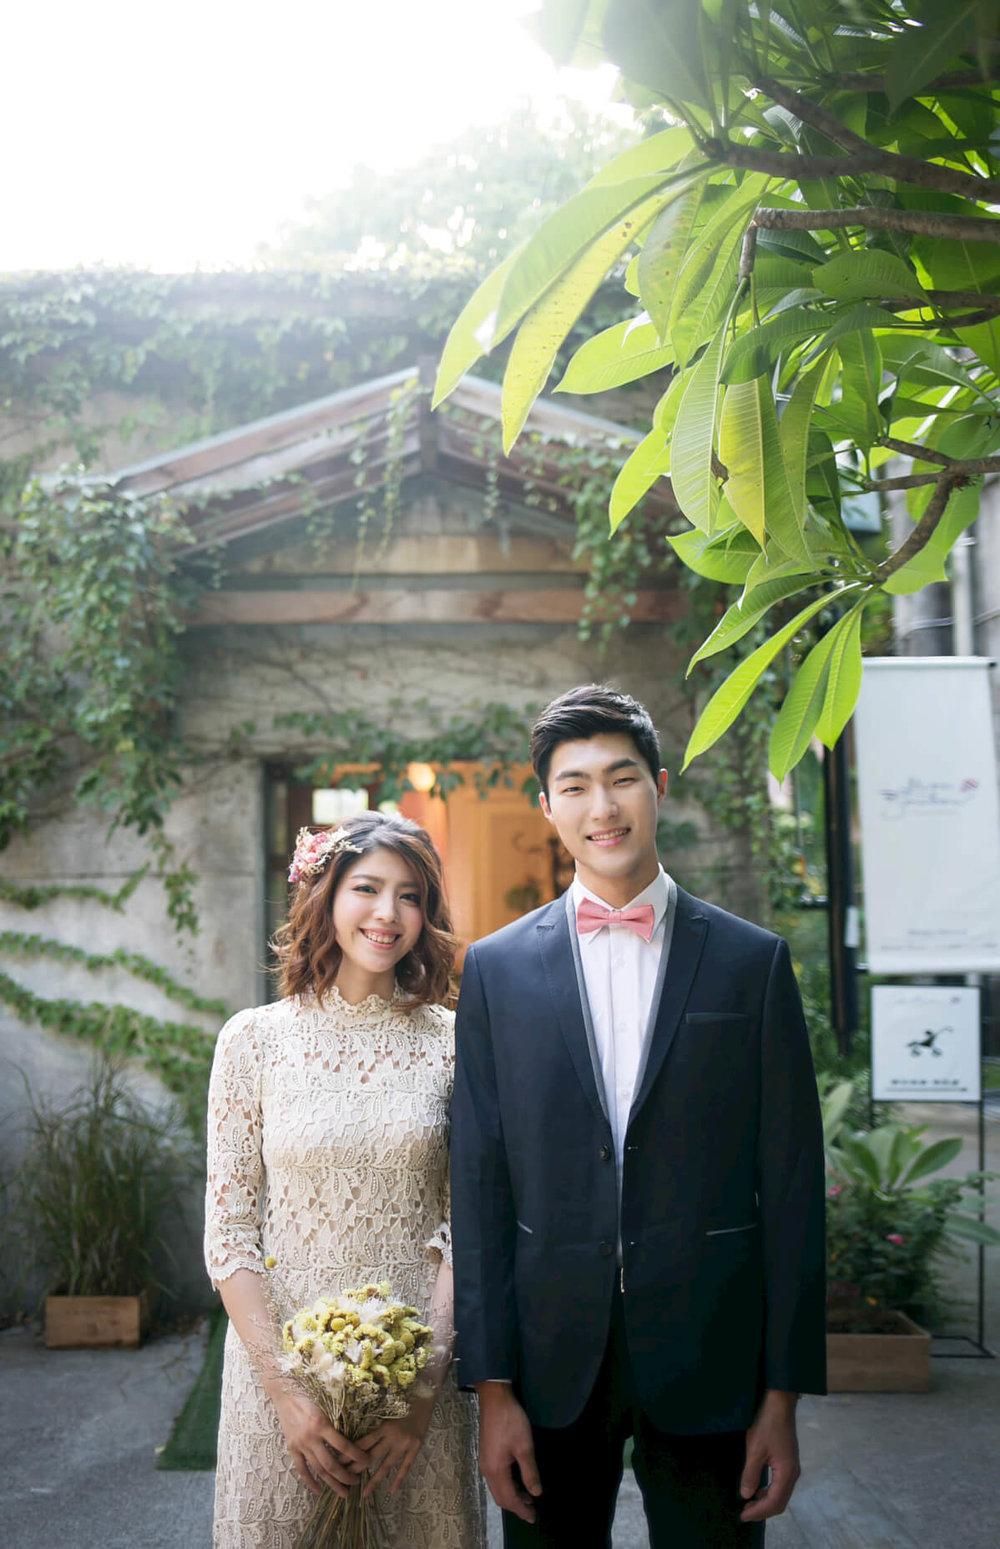 Sprazzi_Professional_Portrait_Photo_Taipei_Kyunghoon_Resize_18.jpg